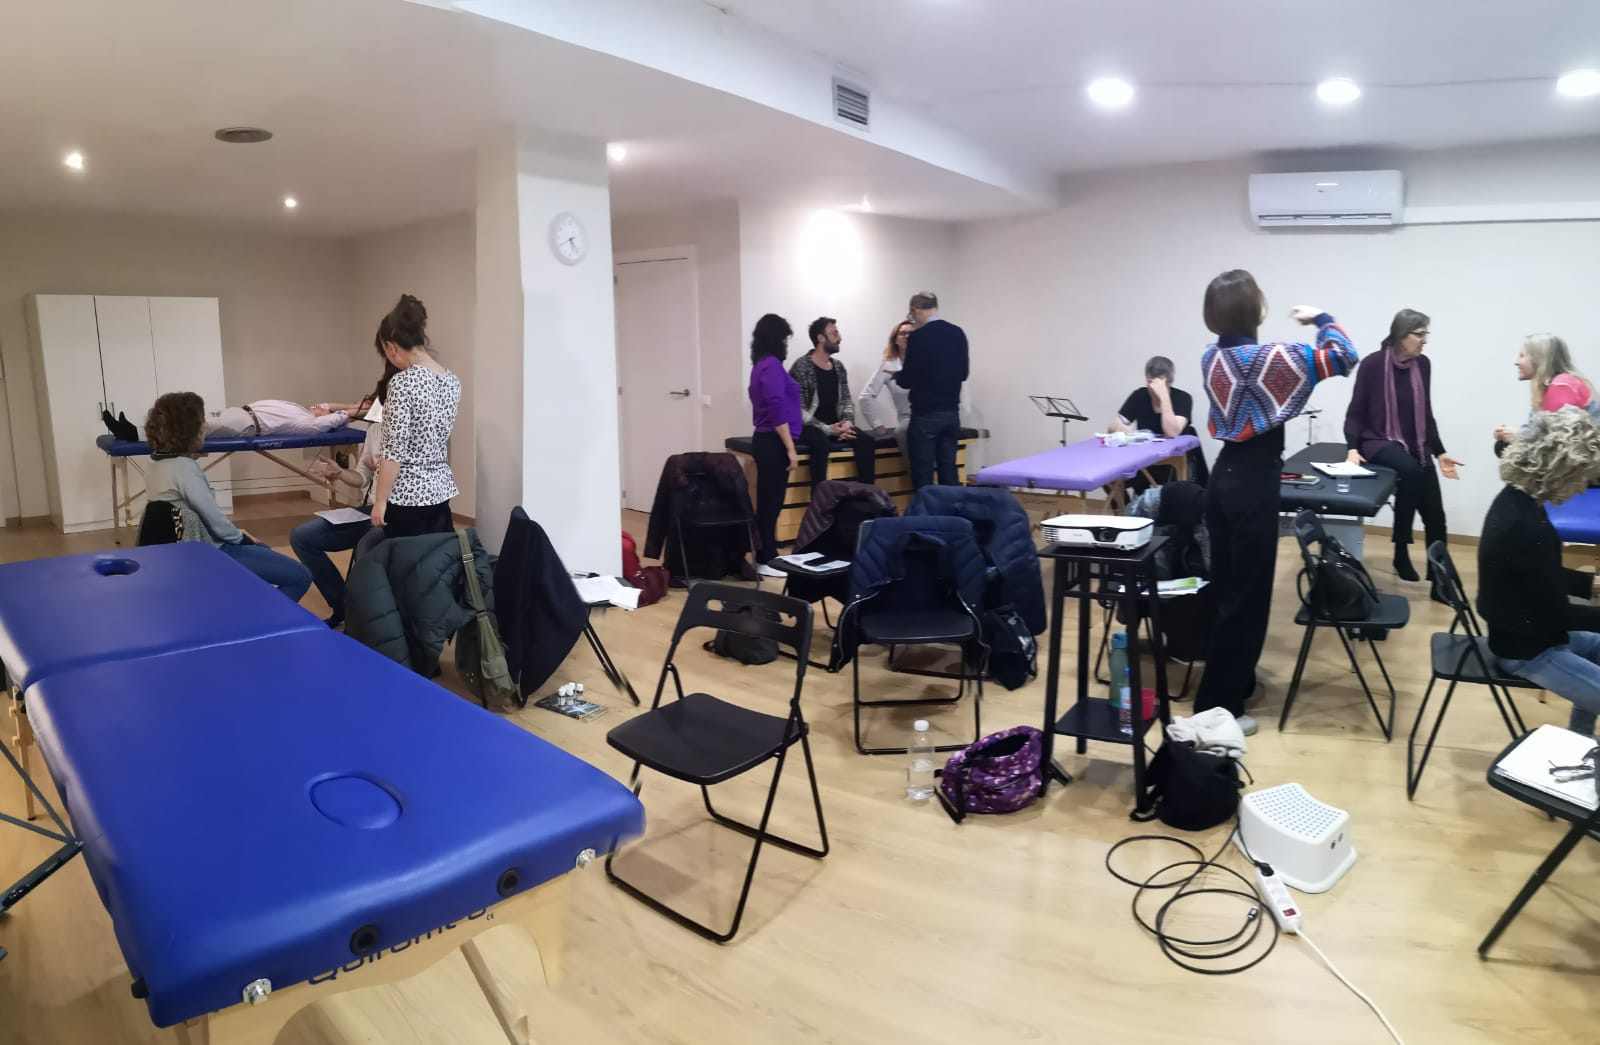 Curso kinesiologia intensivo barcelona